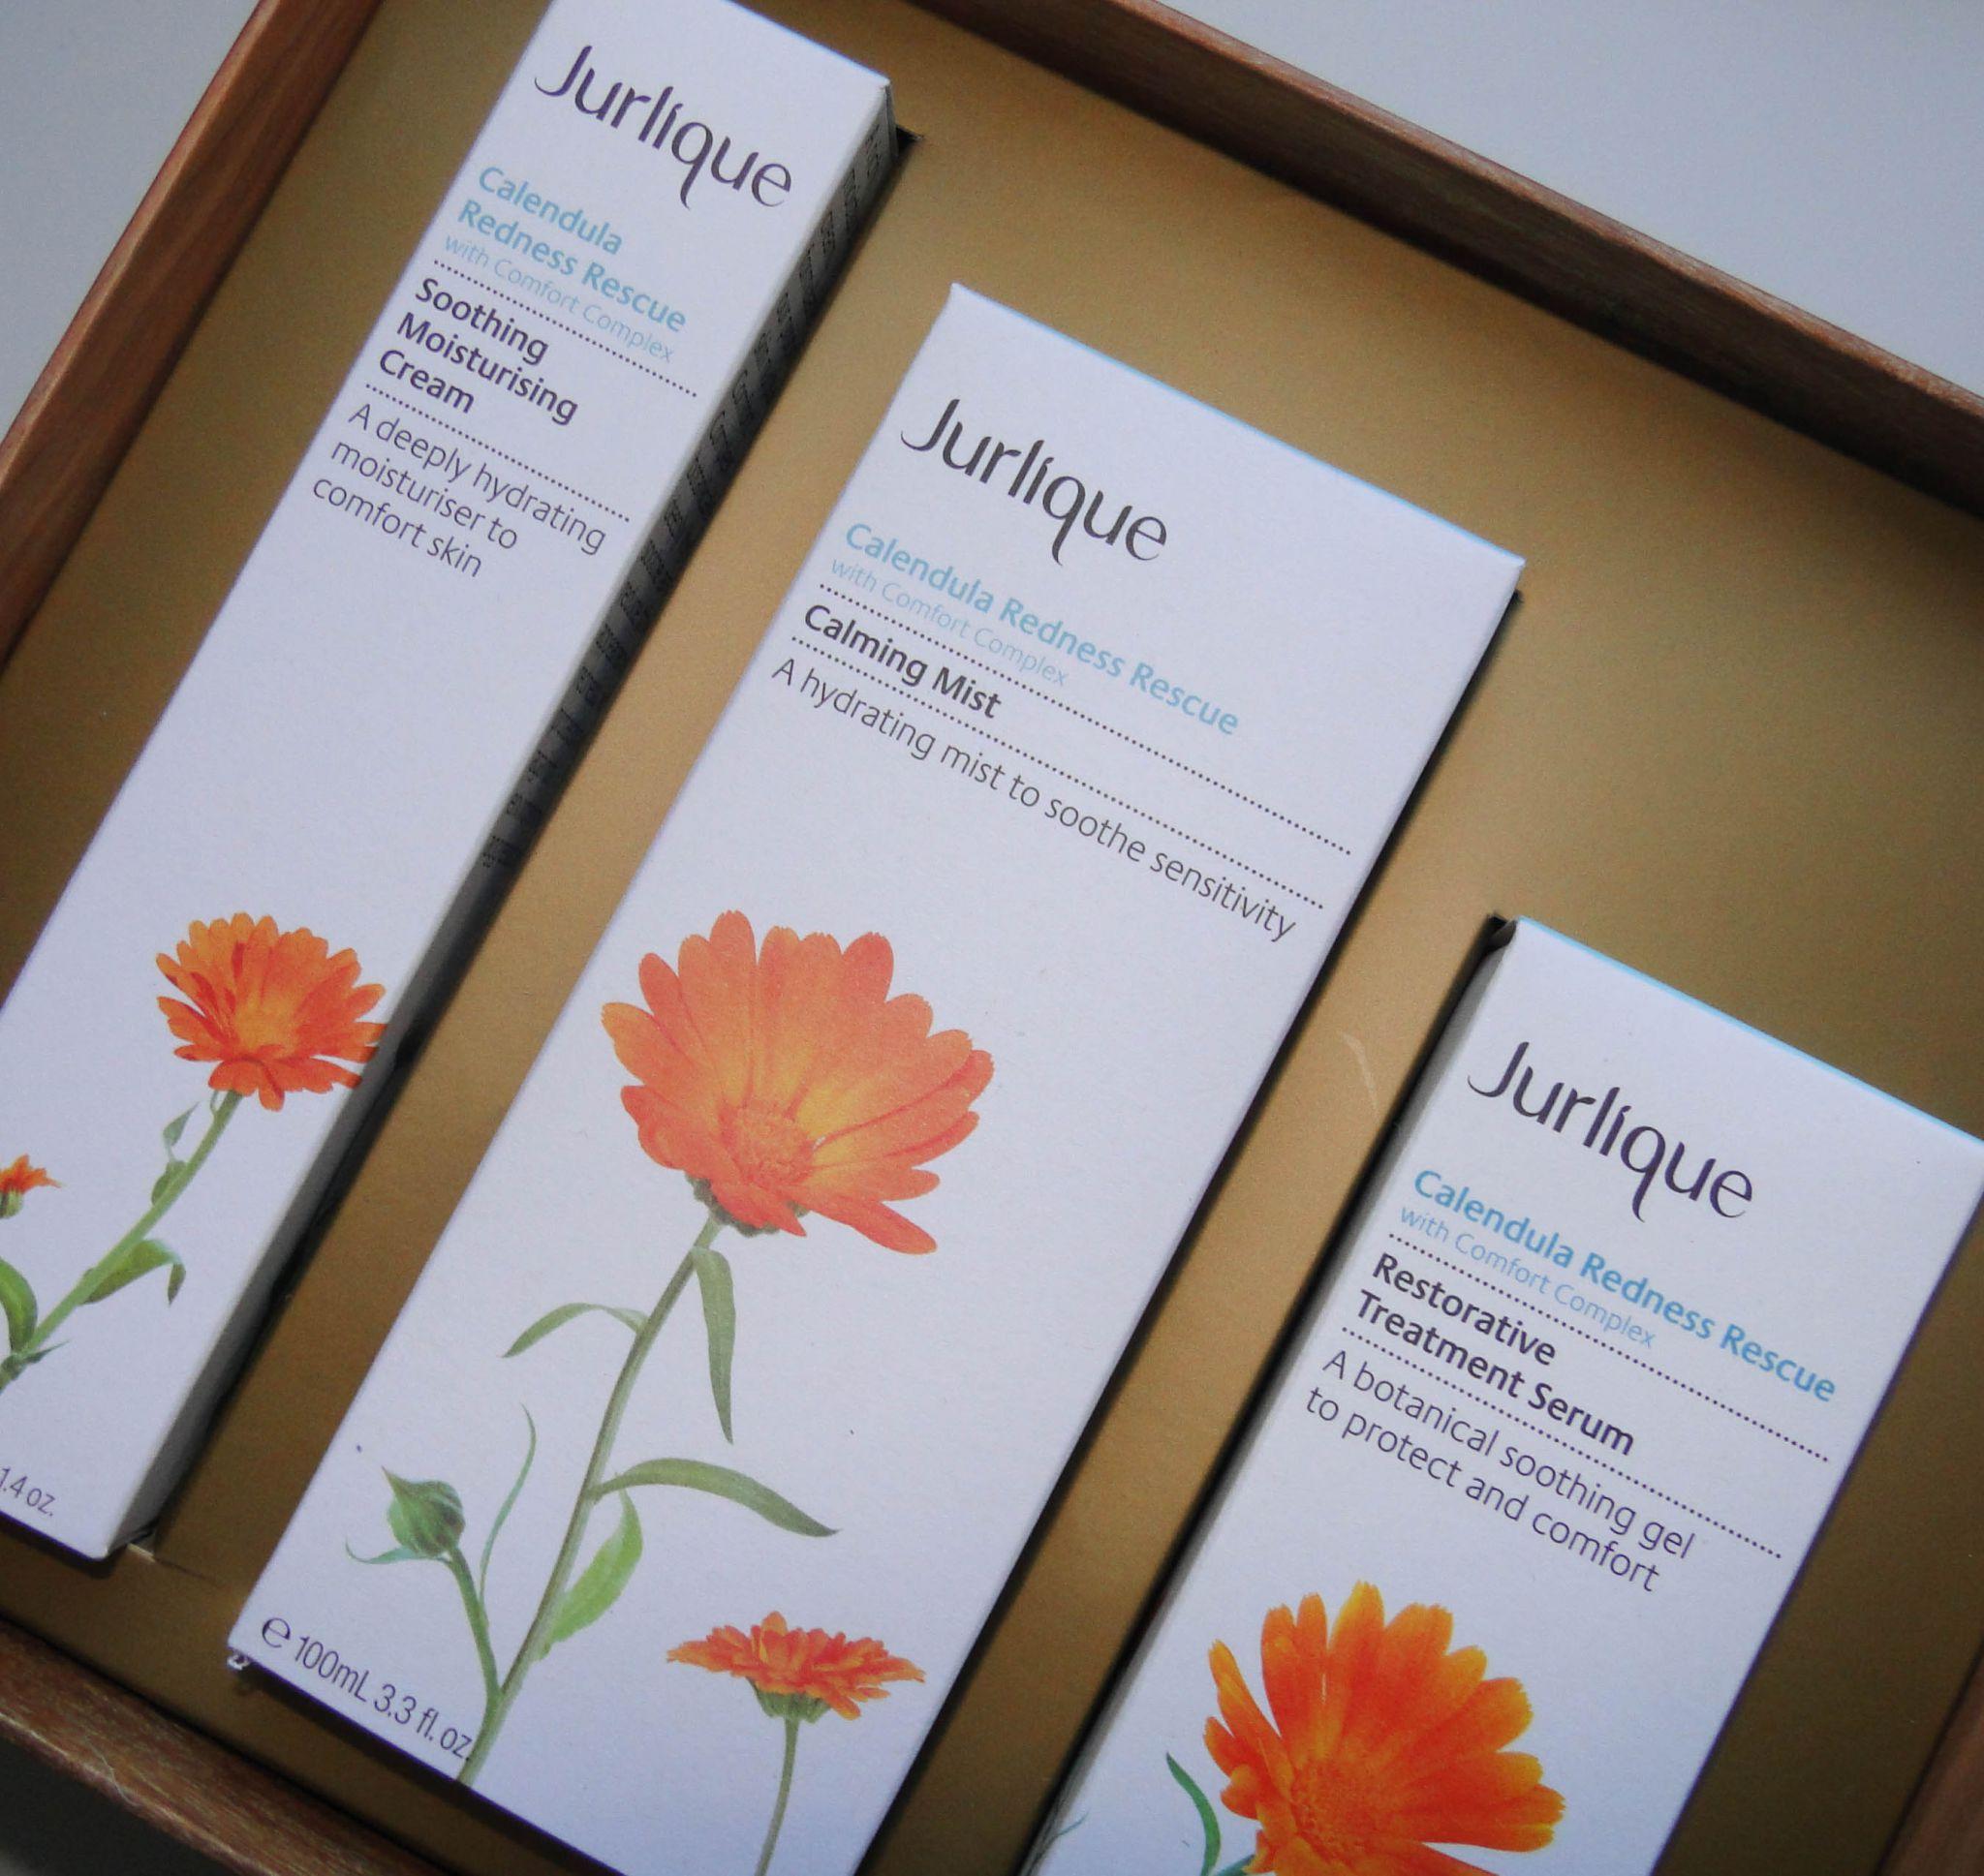 Jurlique Glow Calendula Gift Set-3